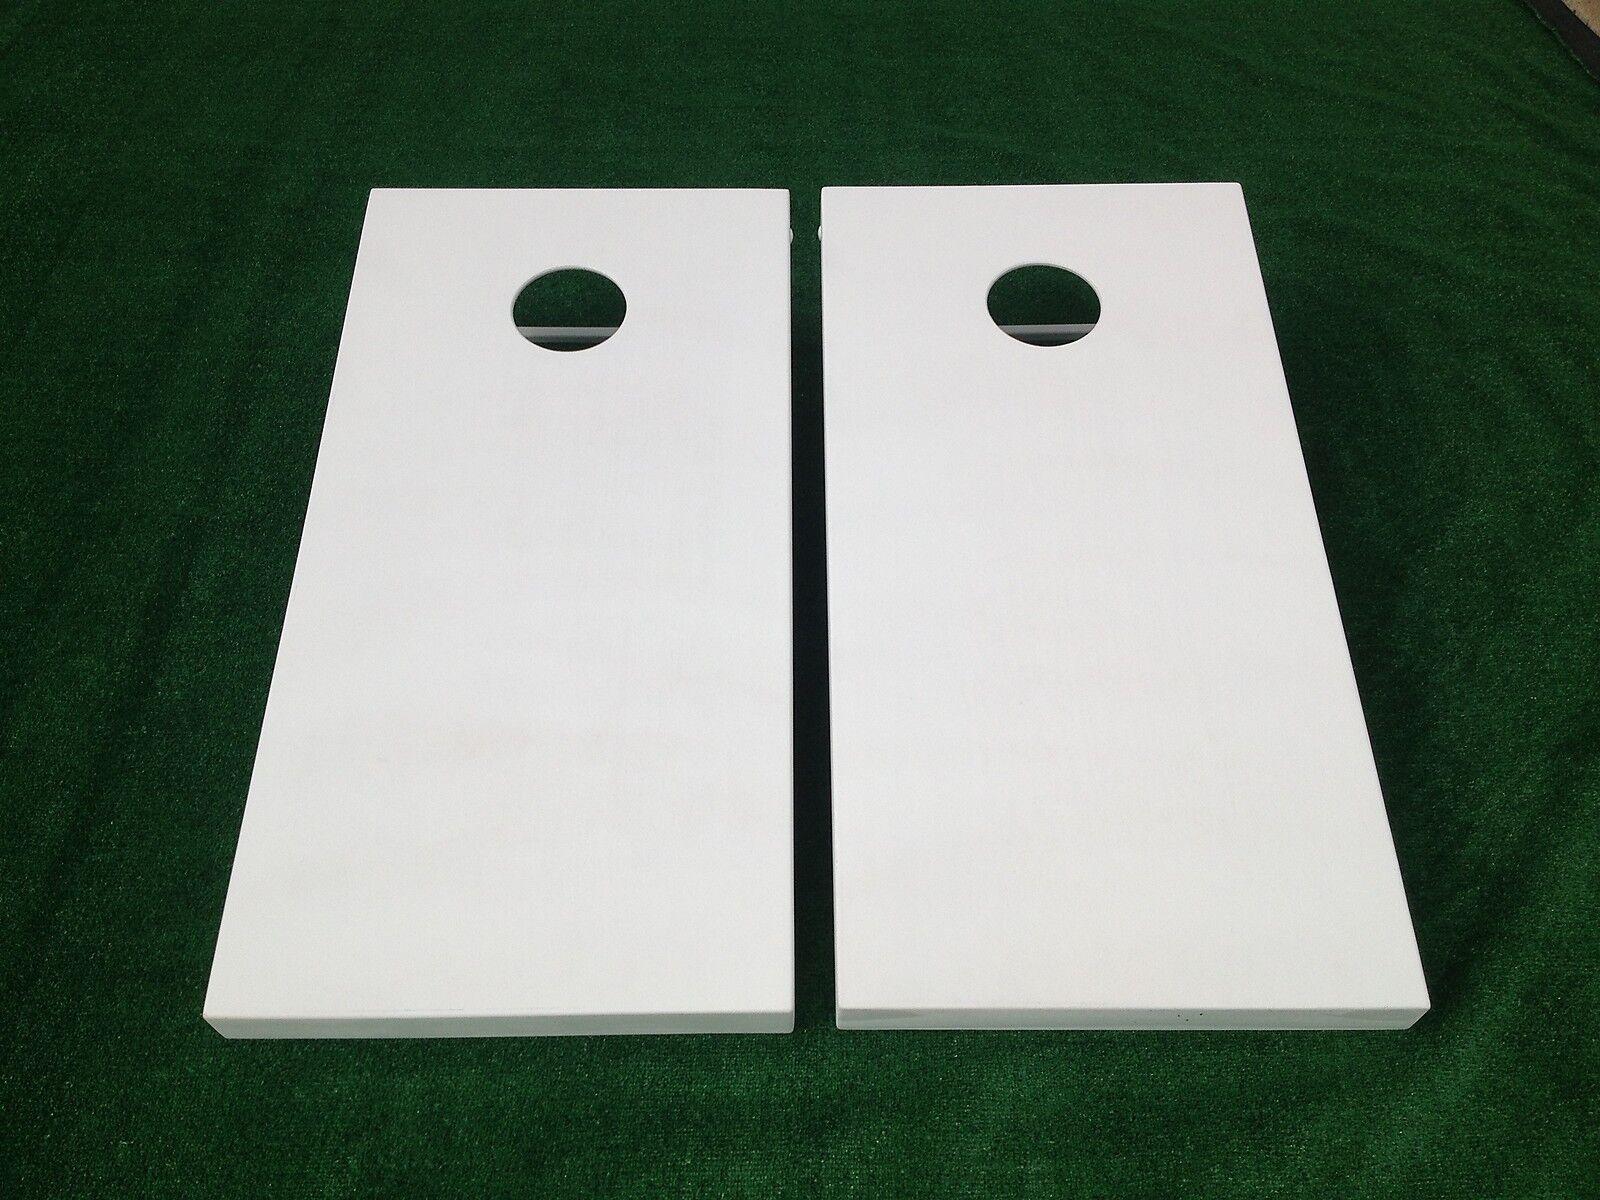 Tremendous White Painted Cornhole Boards Set Bean Bag Toss 8 Aca Pabps2019 Chair Design Images Pabps2019Com